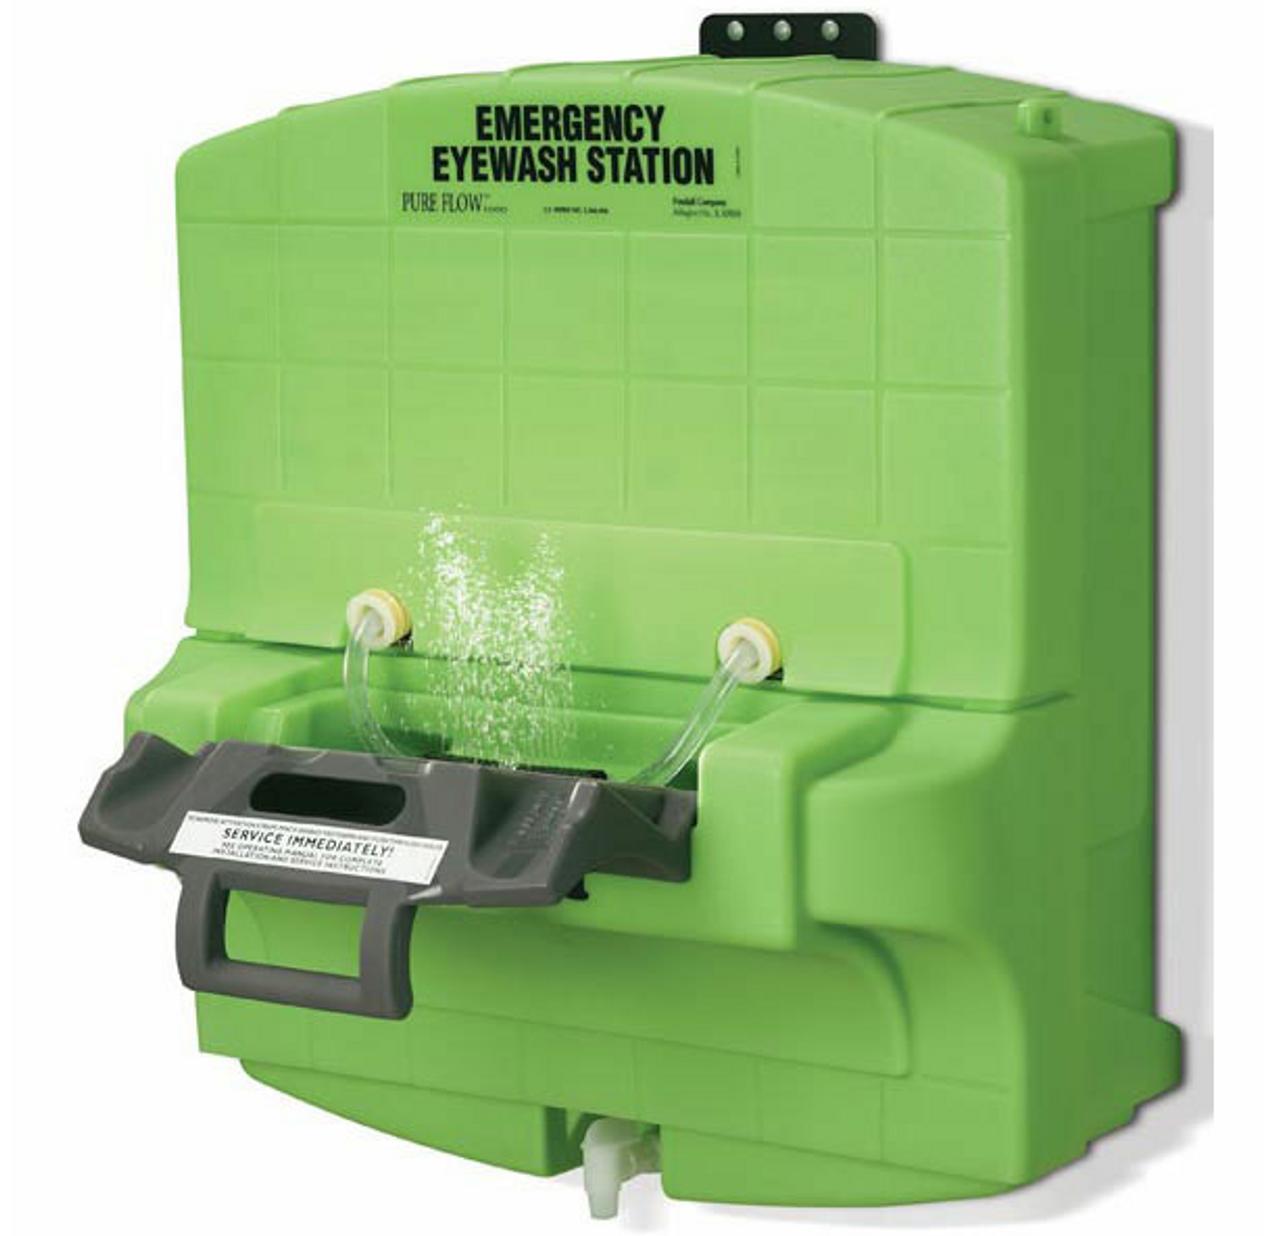 PUREFLOW1000 - Emergency Eyewash Station